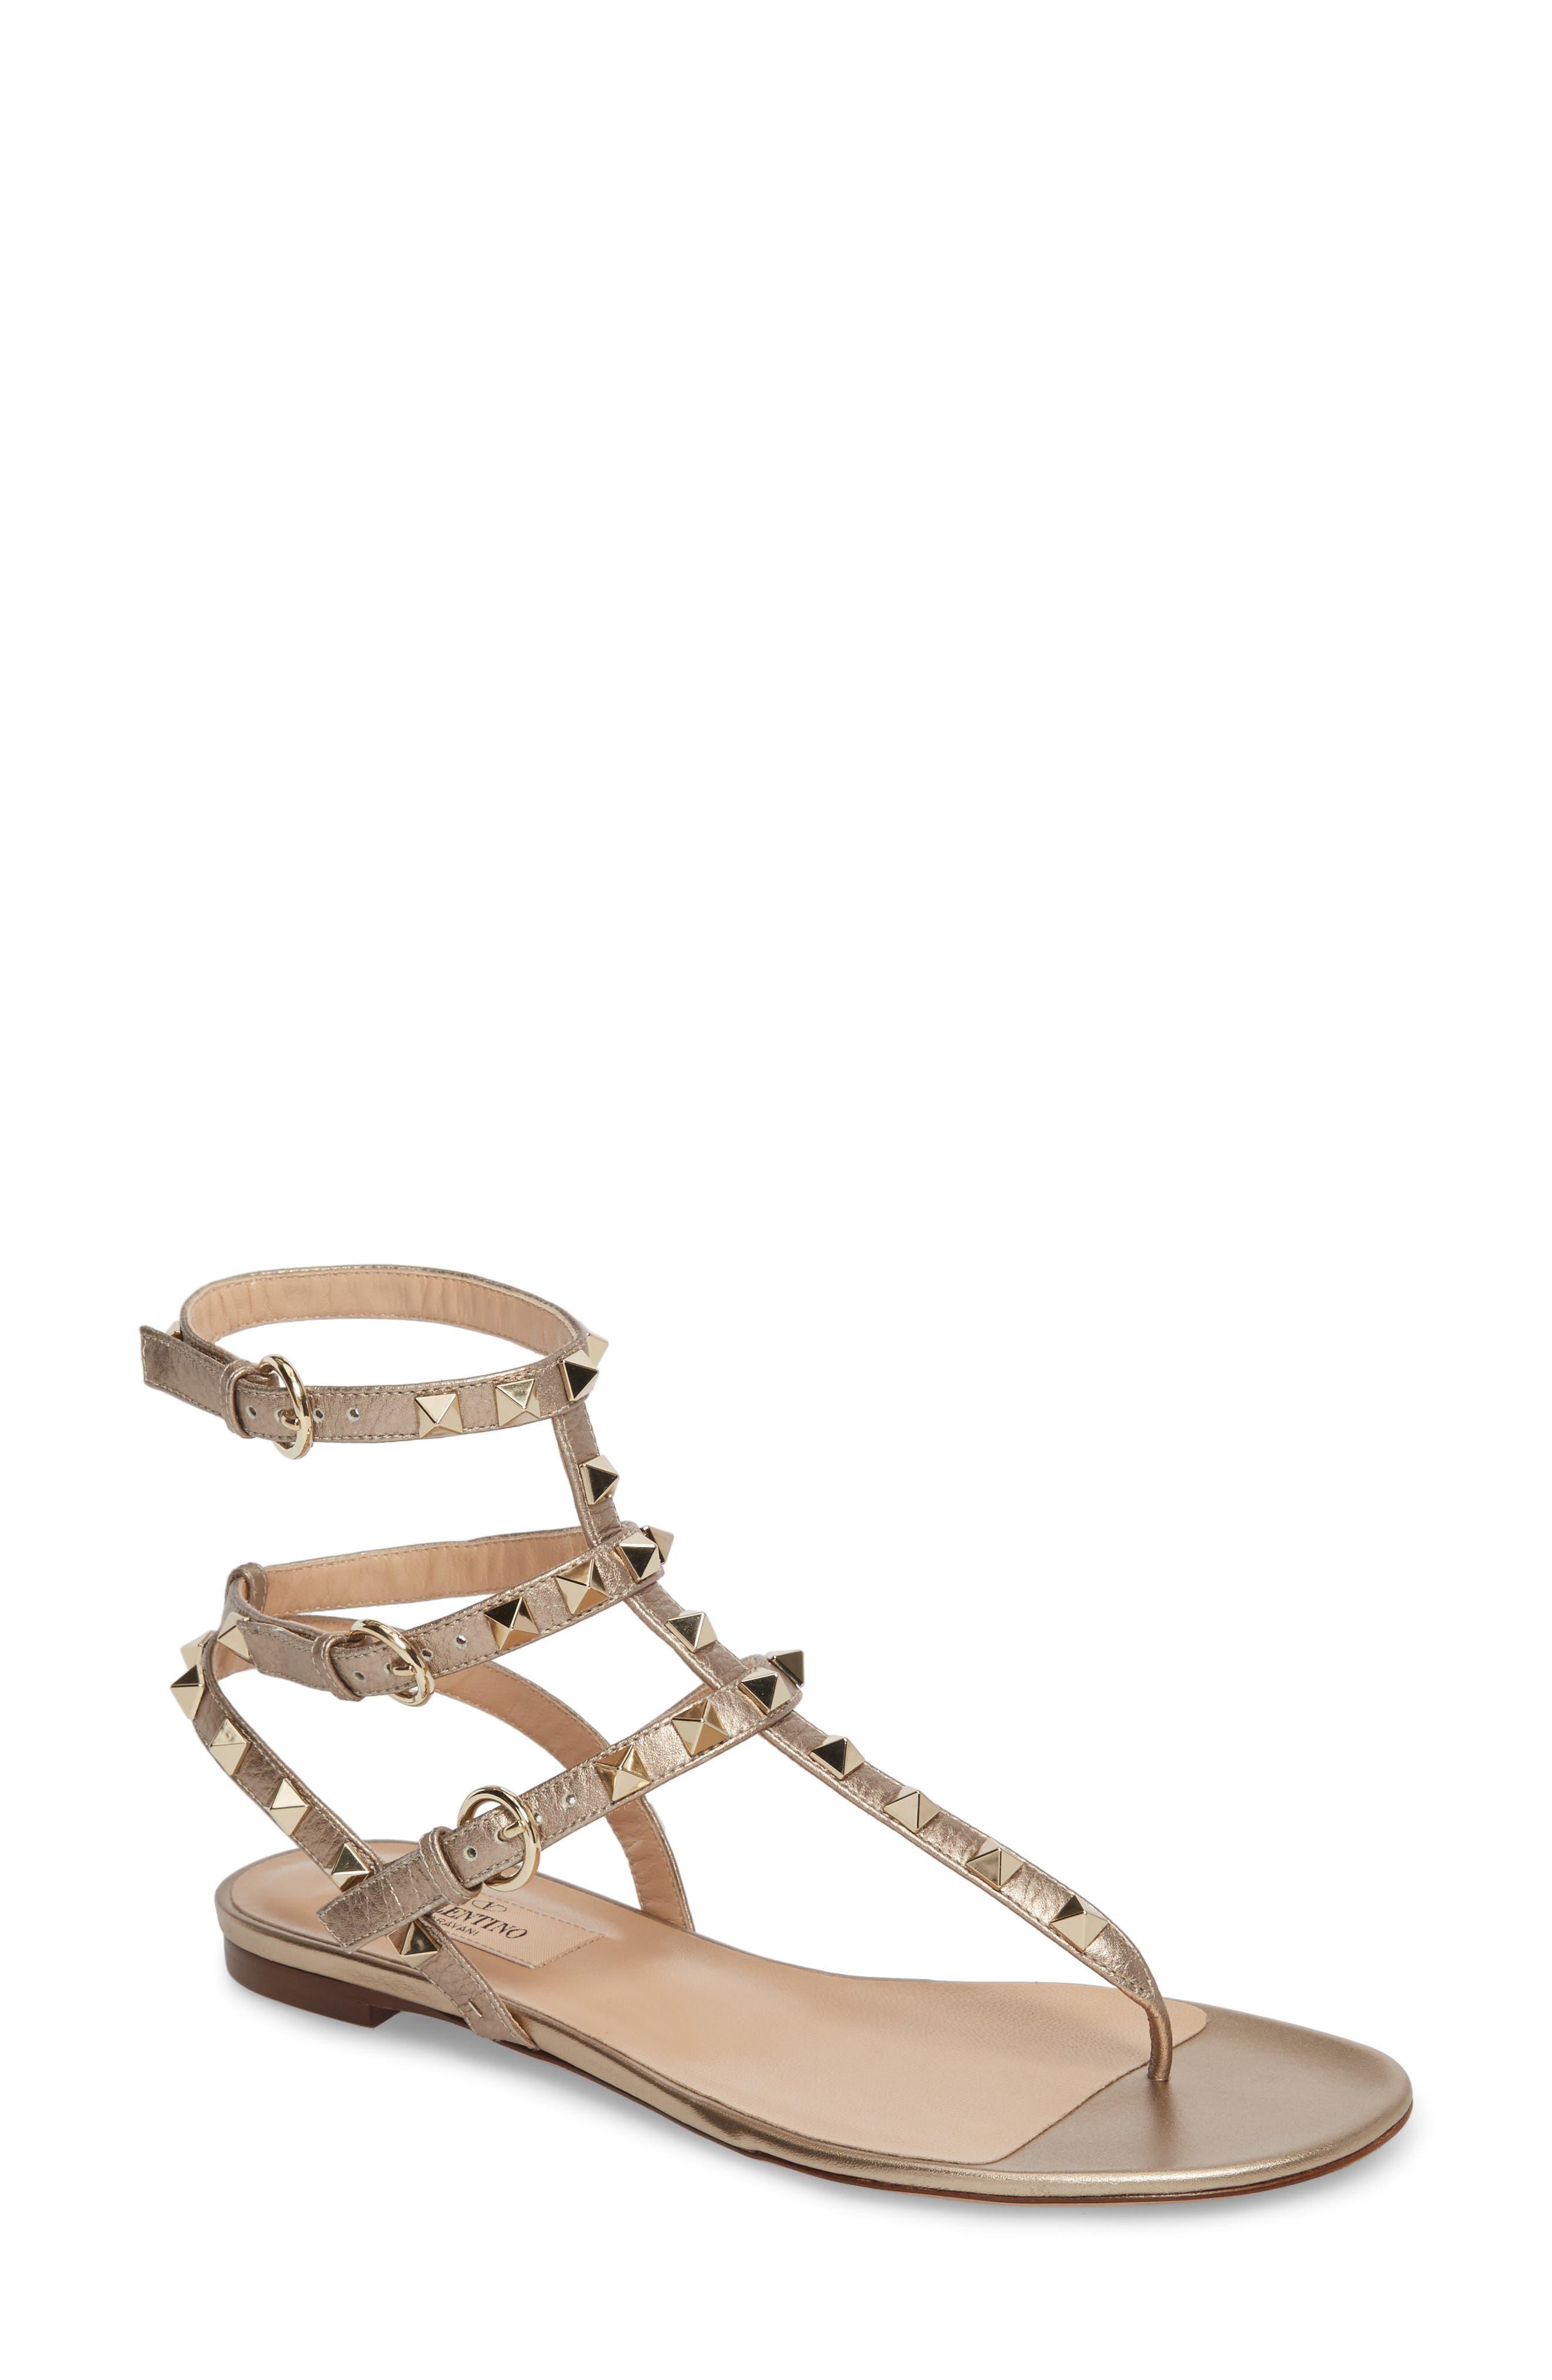 Rockstud Sandal,                         Main,                         color, METALLIC GOLD